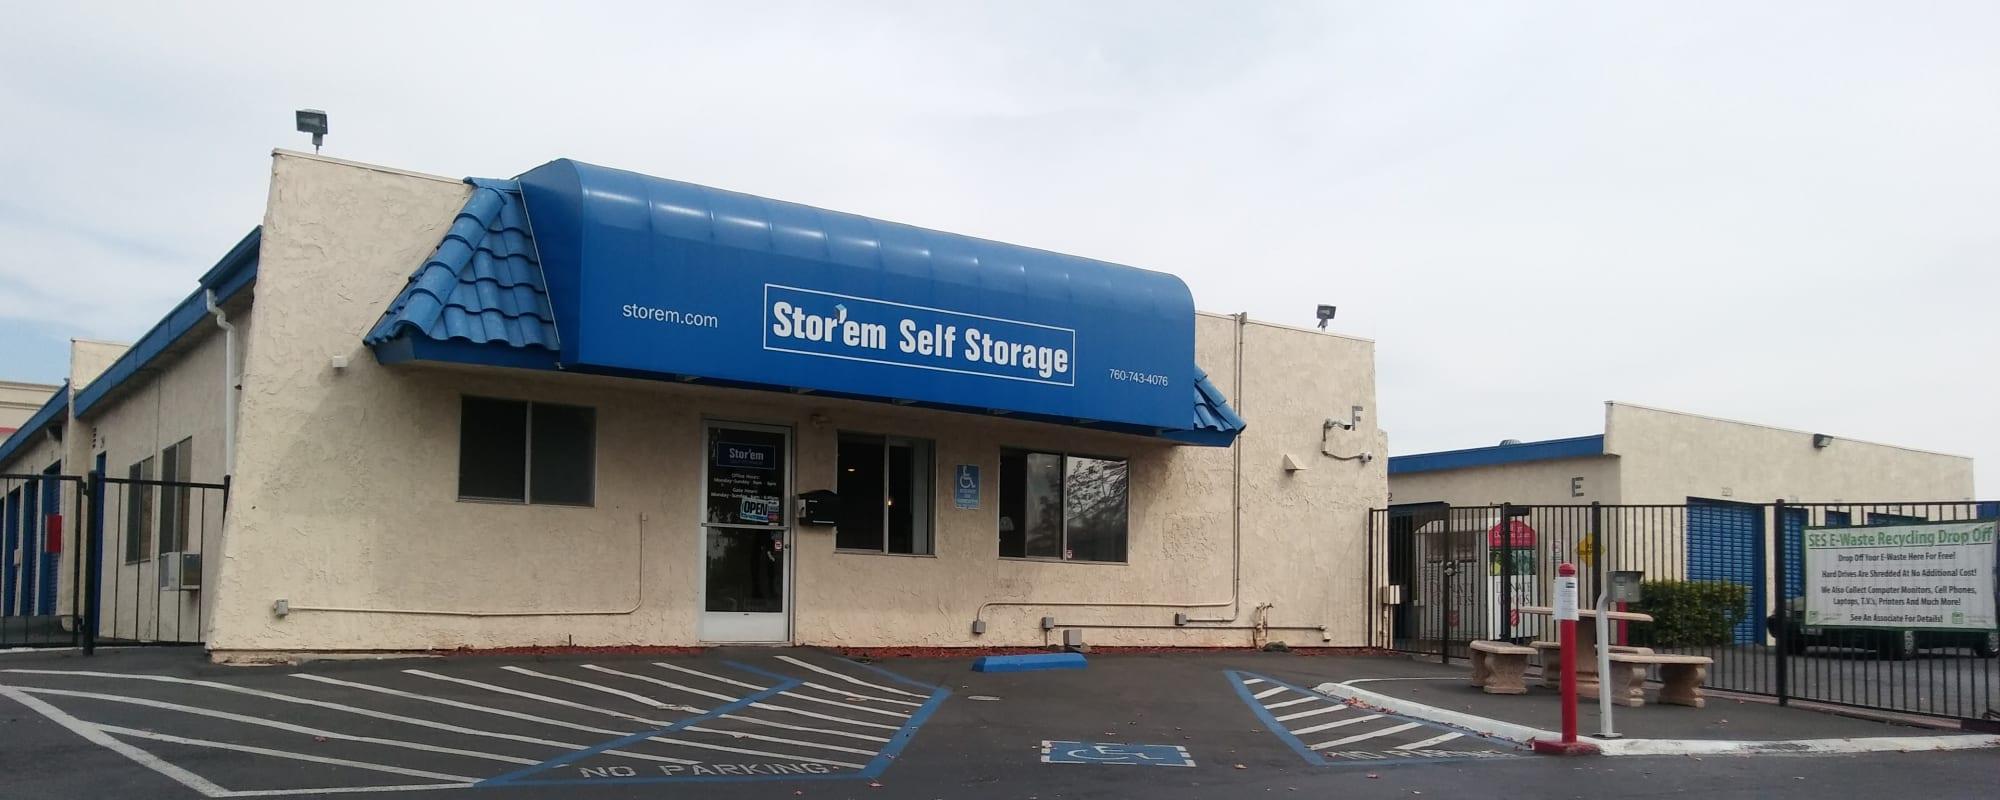 Stor'em Self Storage in San Marcos, California